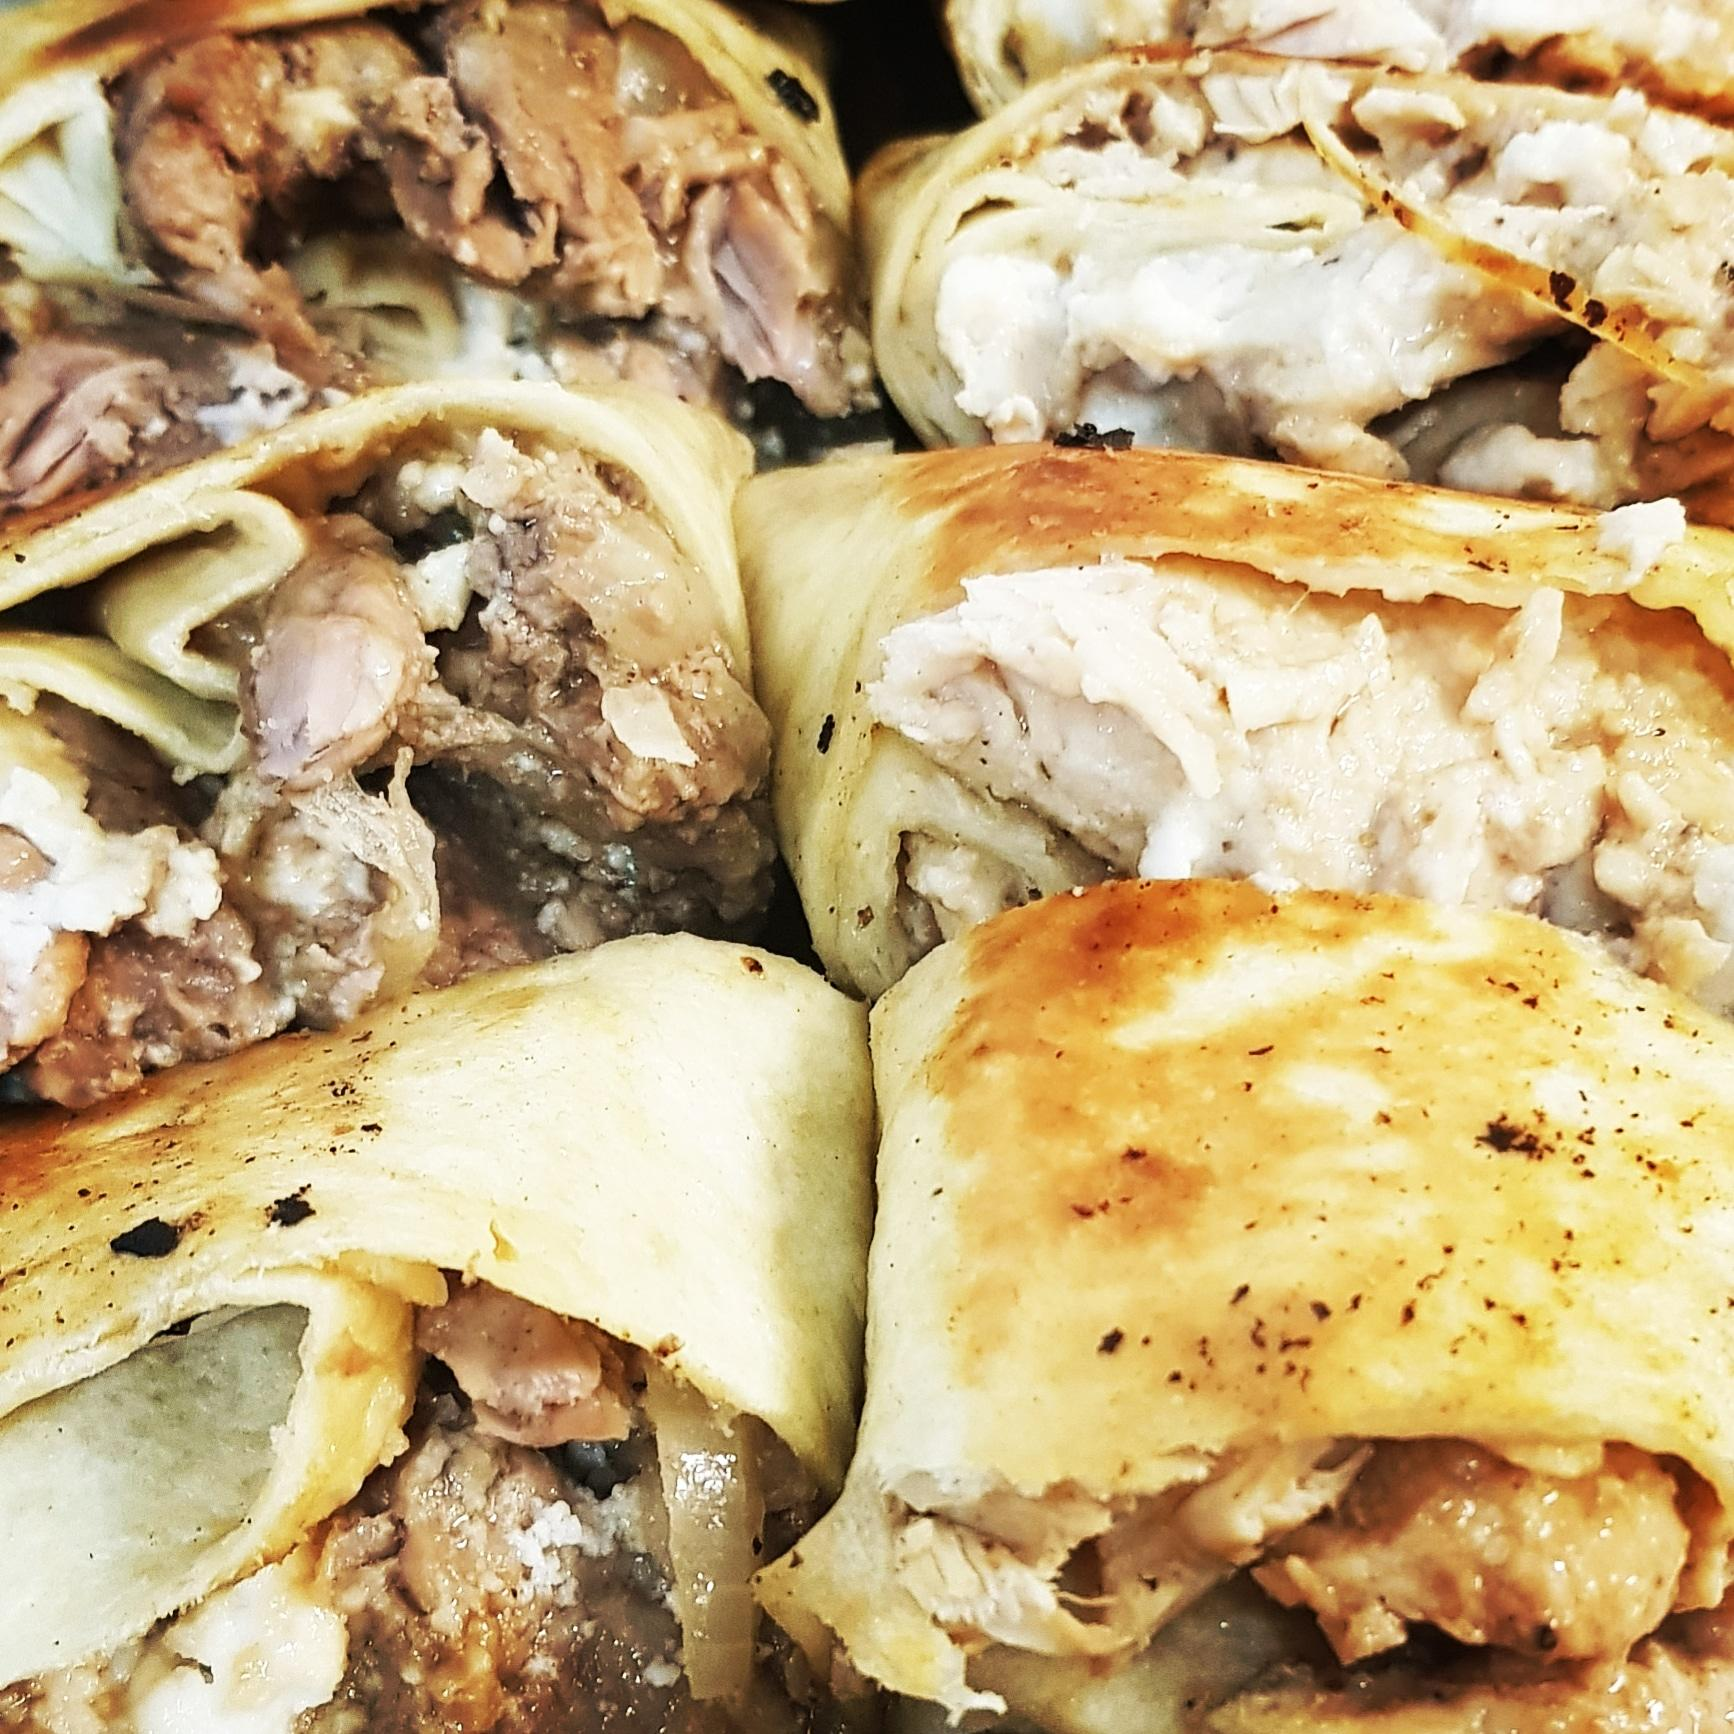 Shawarma poulet et shawarma boeuf